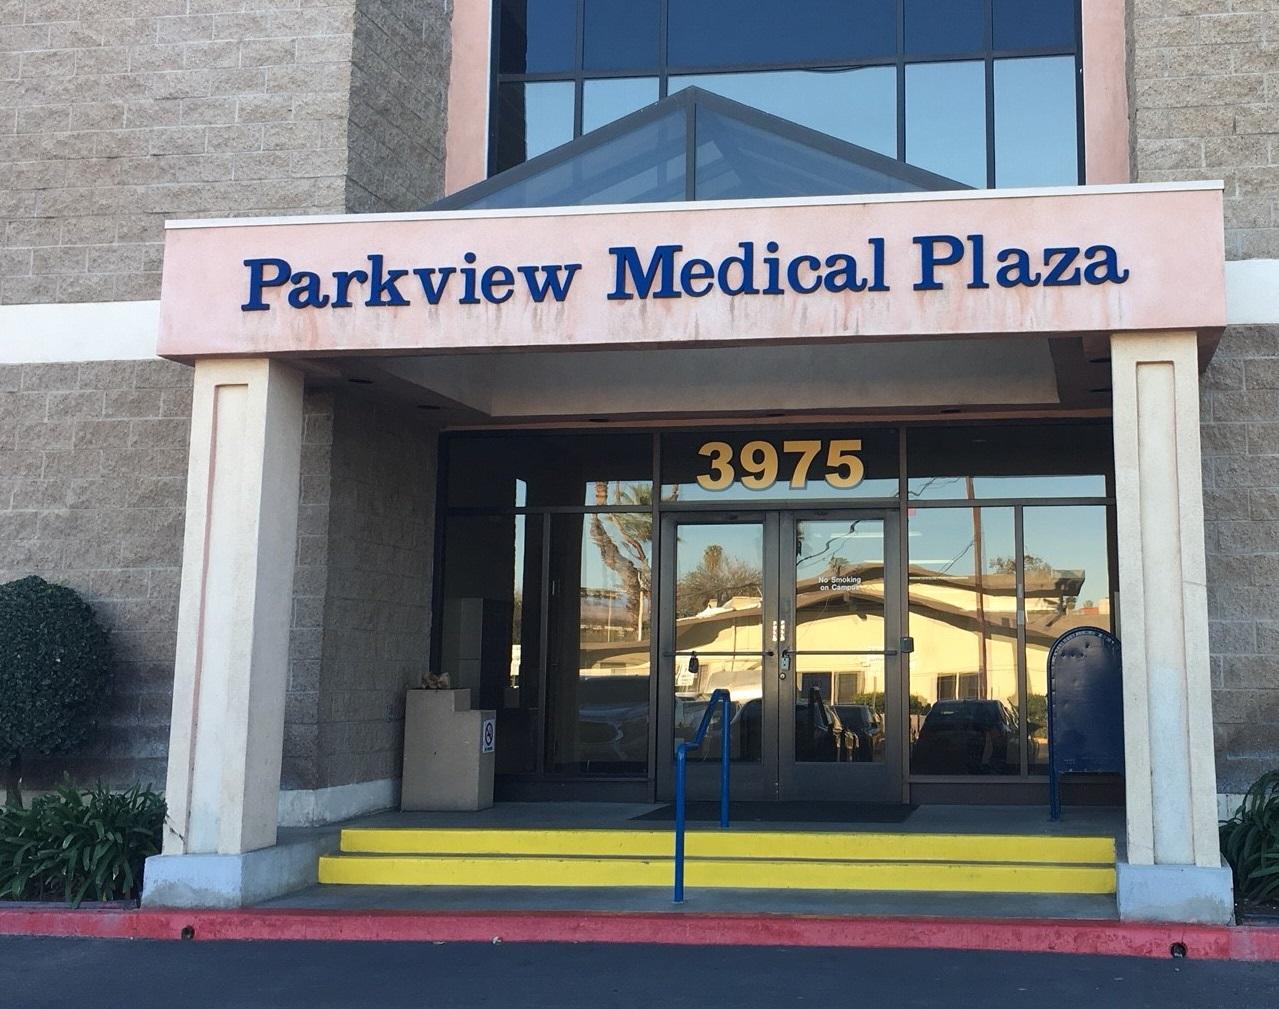 Riverside sleep center - Advanced Sleep Medicine Services - Entrance